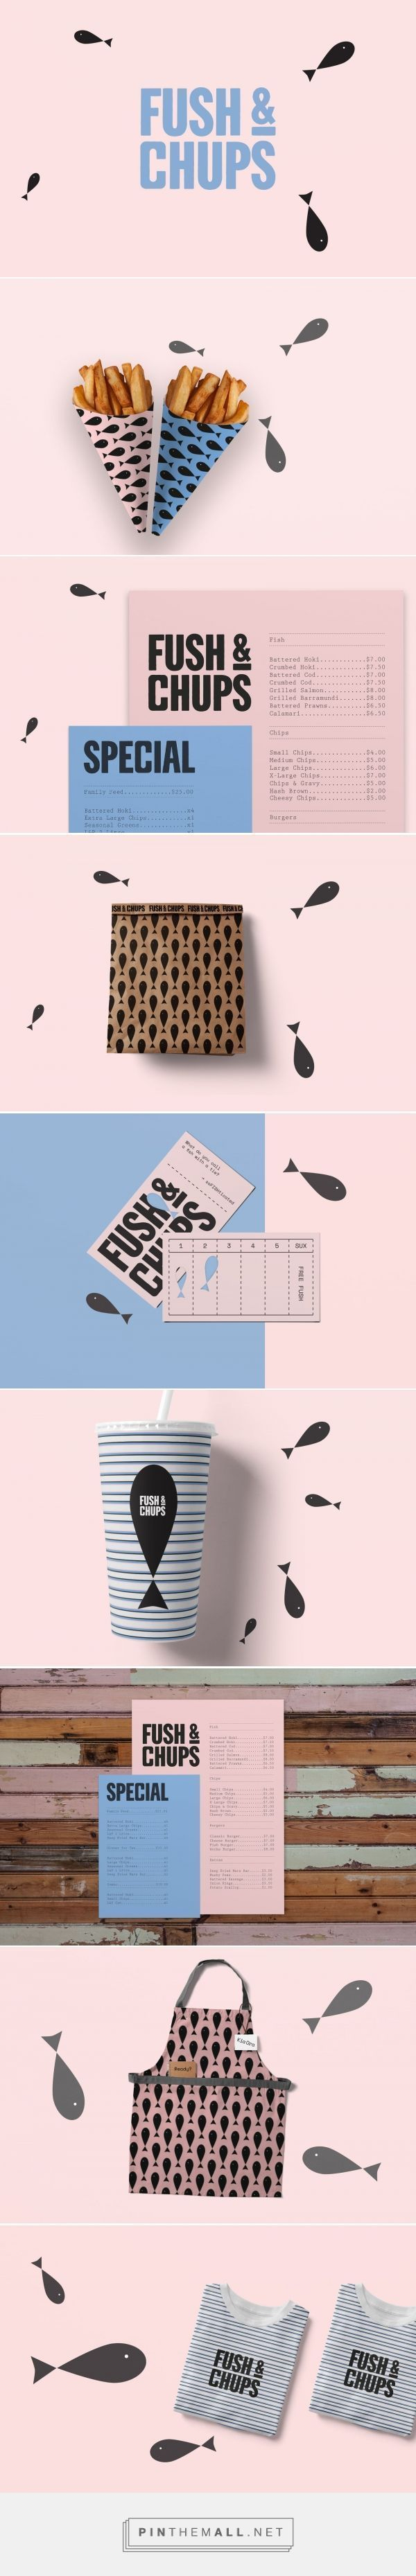 Fush & Chups Restaurant Branding by Brandon McIntosh   Fivestar Branding Agency – Design and Branding Agency & Curated Inspiration Gallery